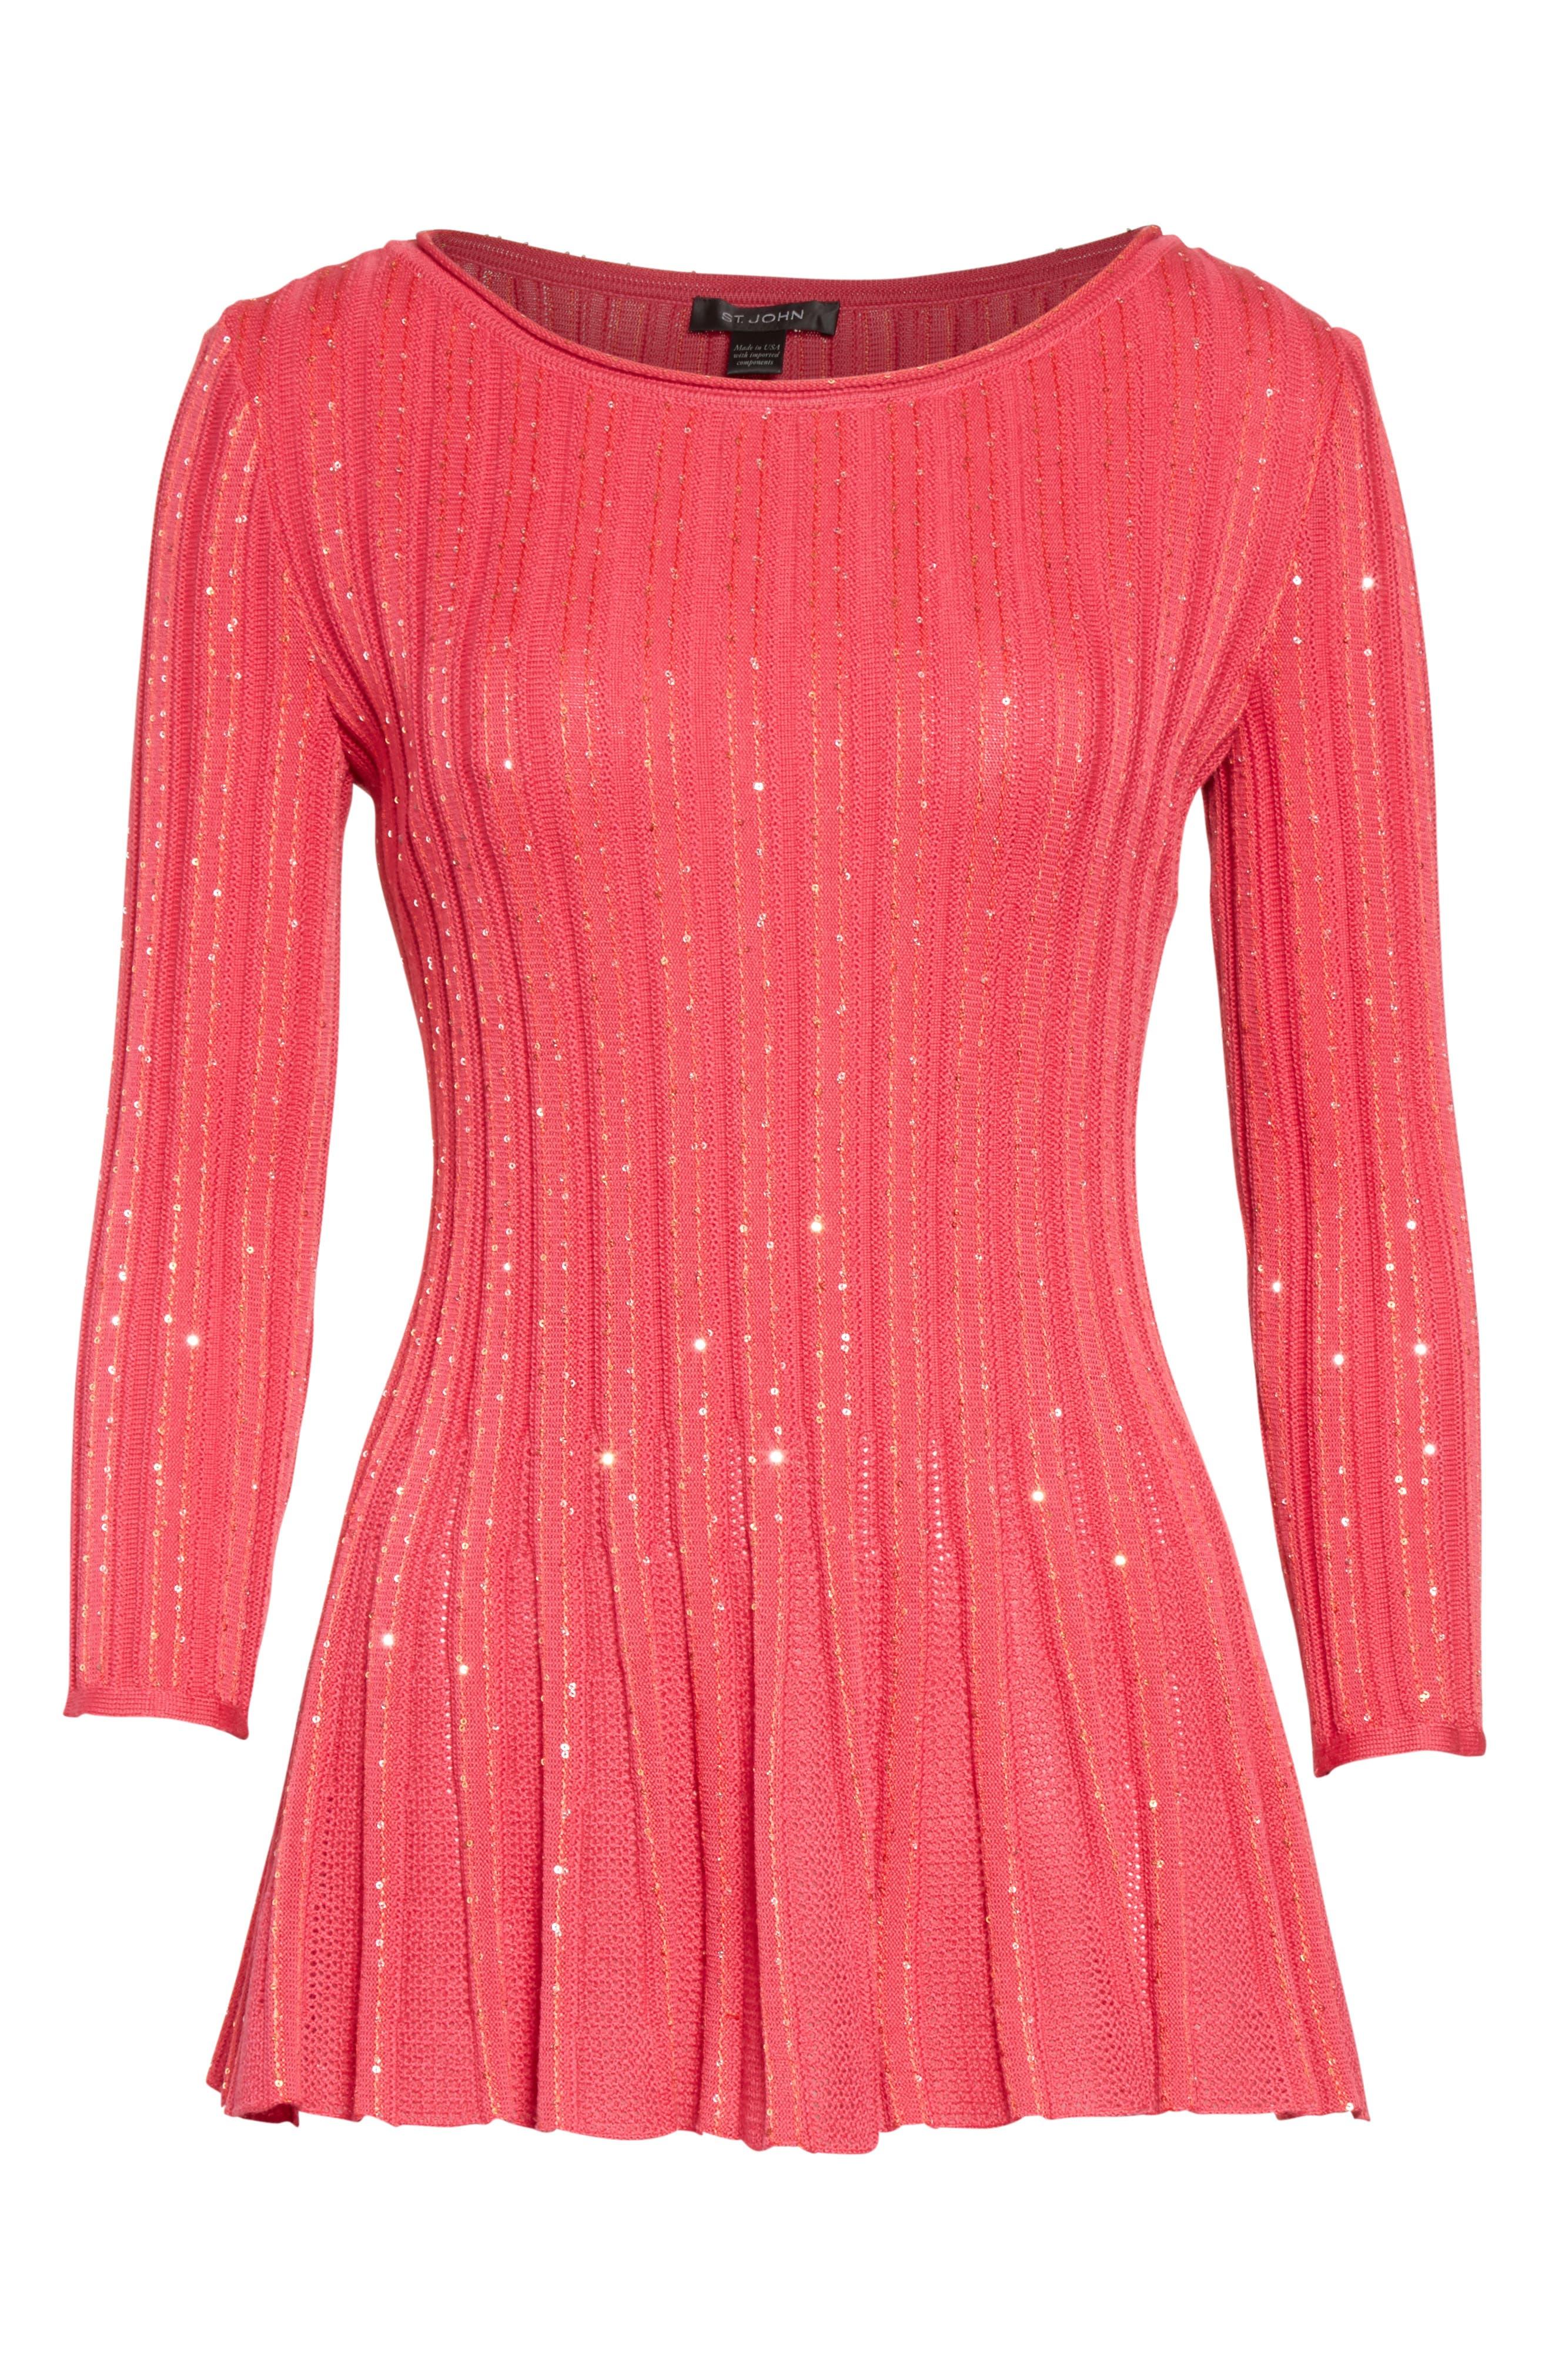 Chriag Sequin Knit Peplum Top,                             Alternate thumbnail 7, color,                             Indian Rose